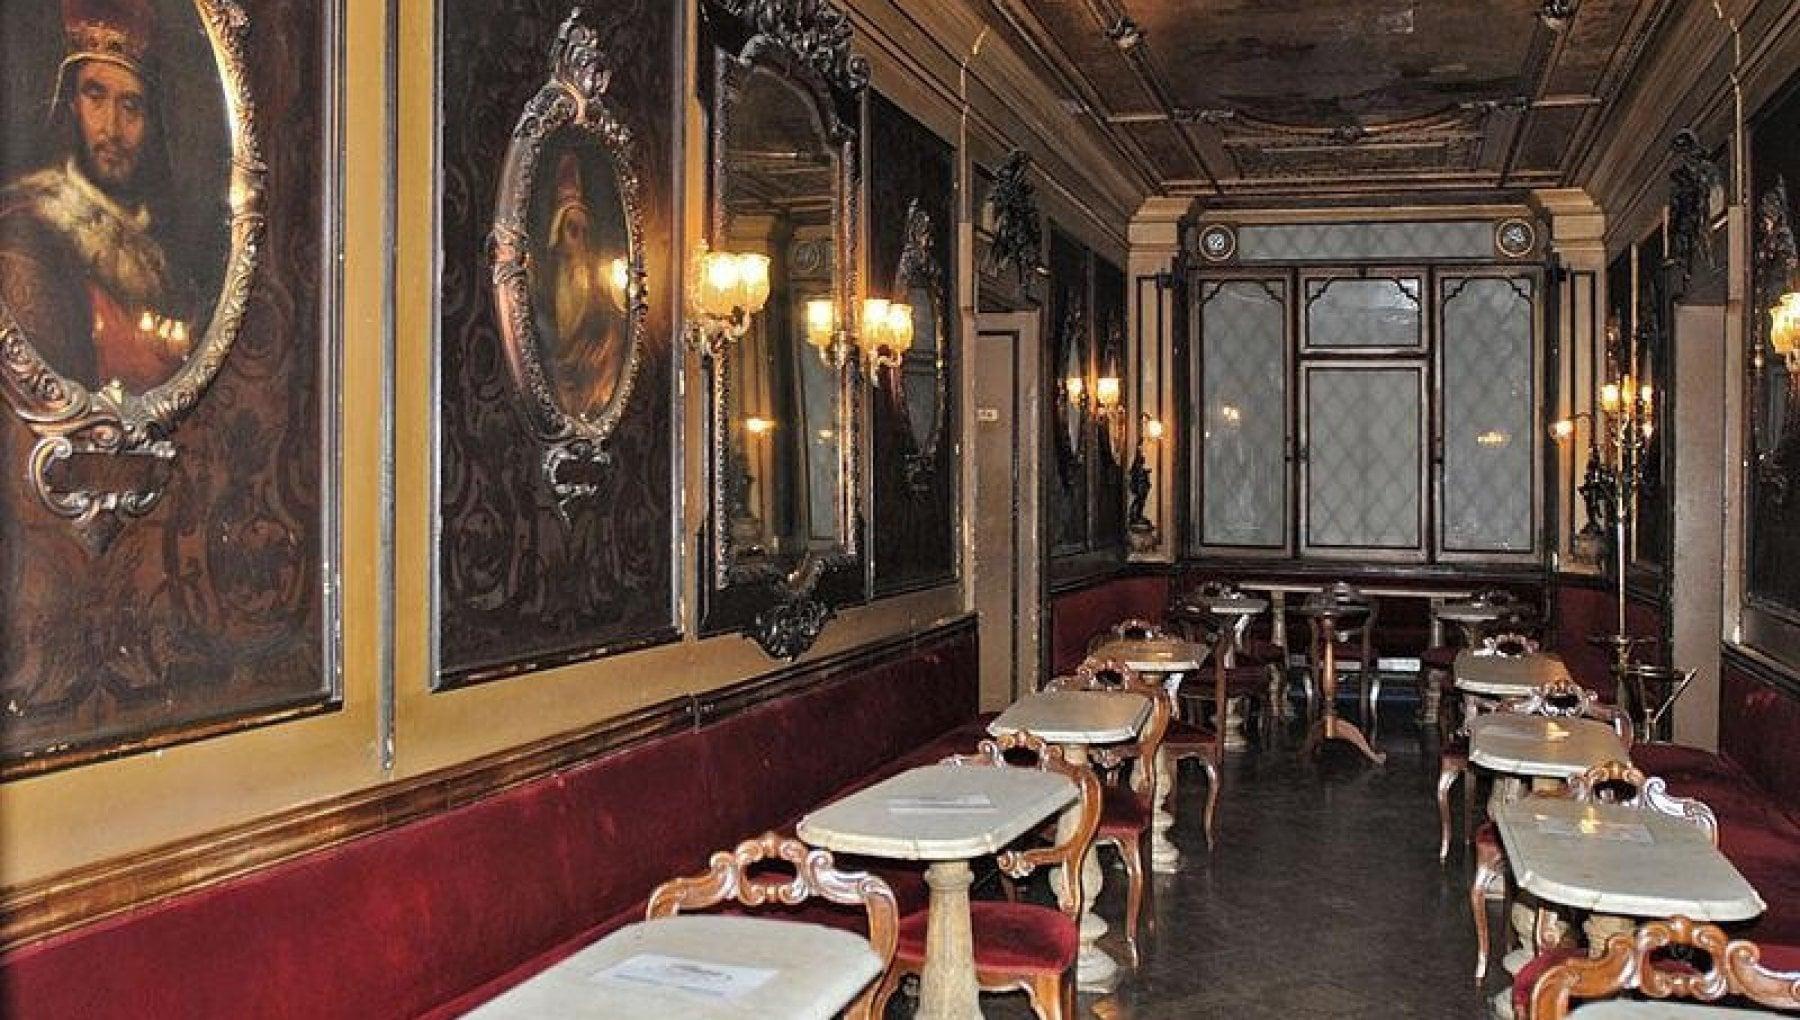 Il caffe Florian spegne 300 candeline. Ma in una Venezia vuota rischia di essere lultima